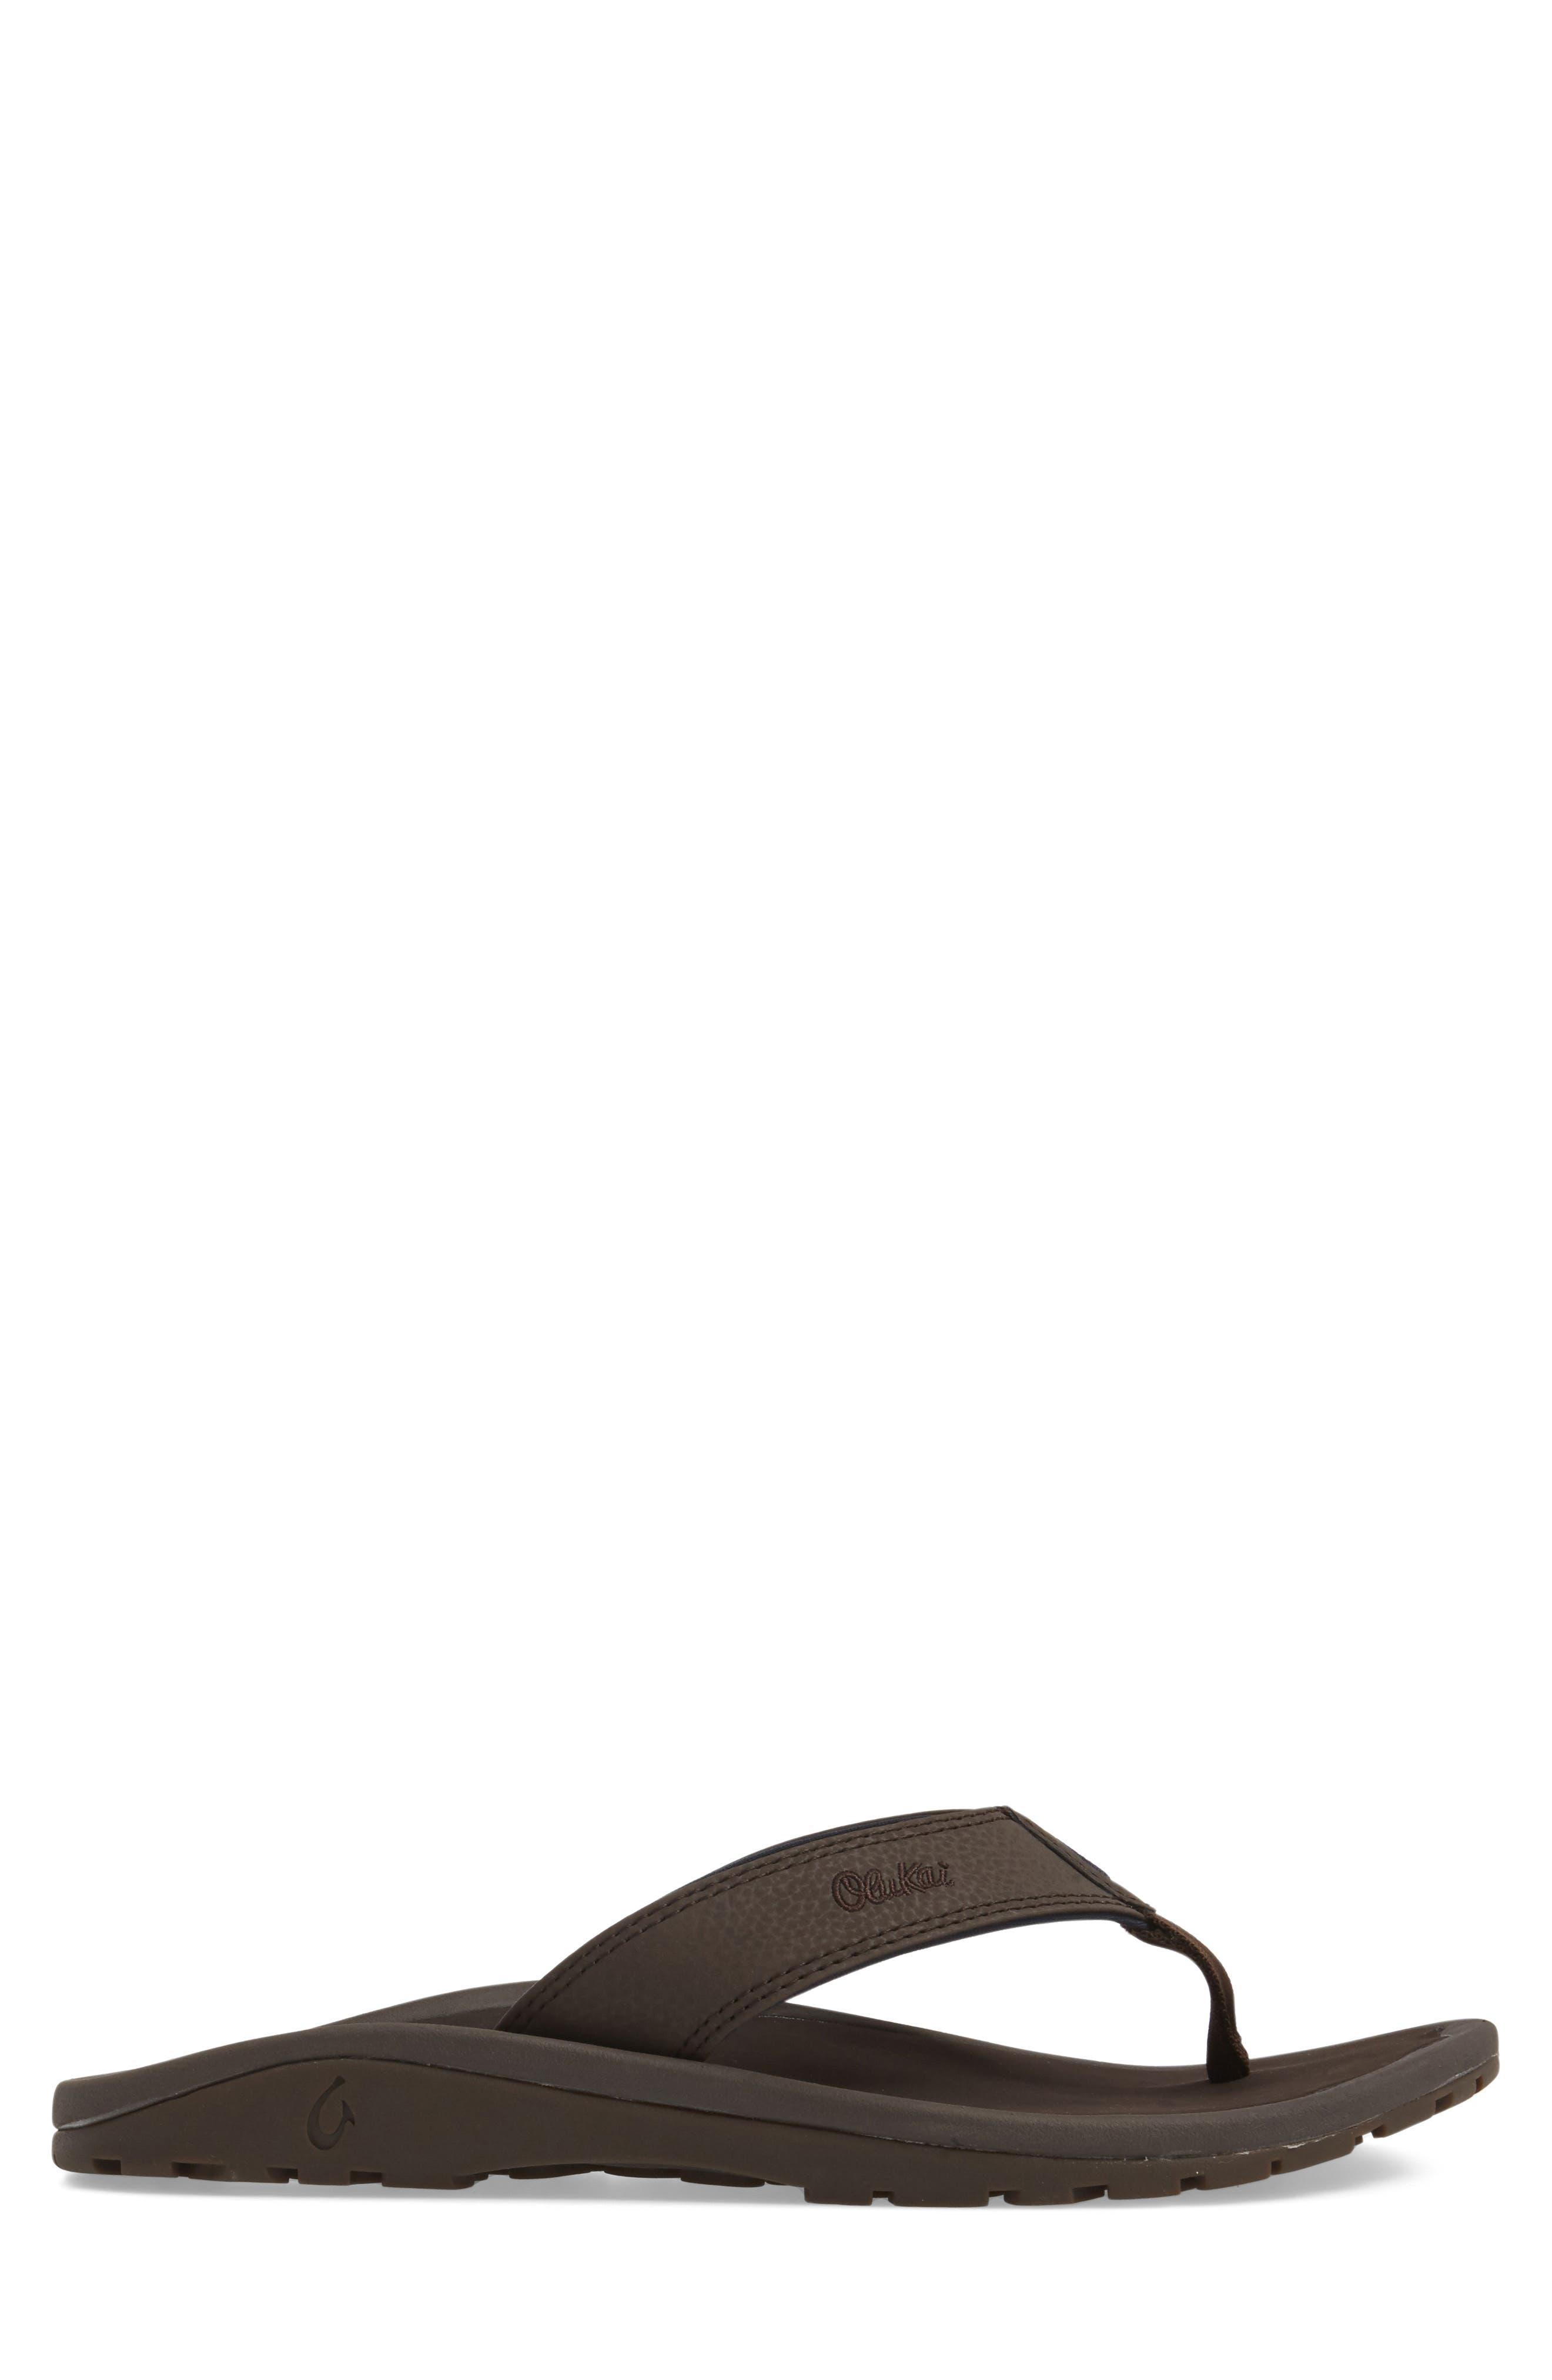 Alternate Image 3  - OluKai 'Ohana' Flip Flop (Men)